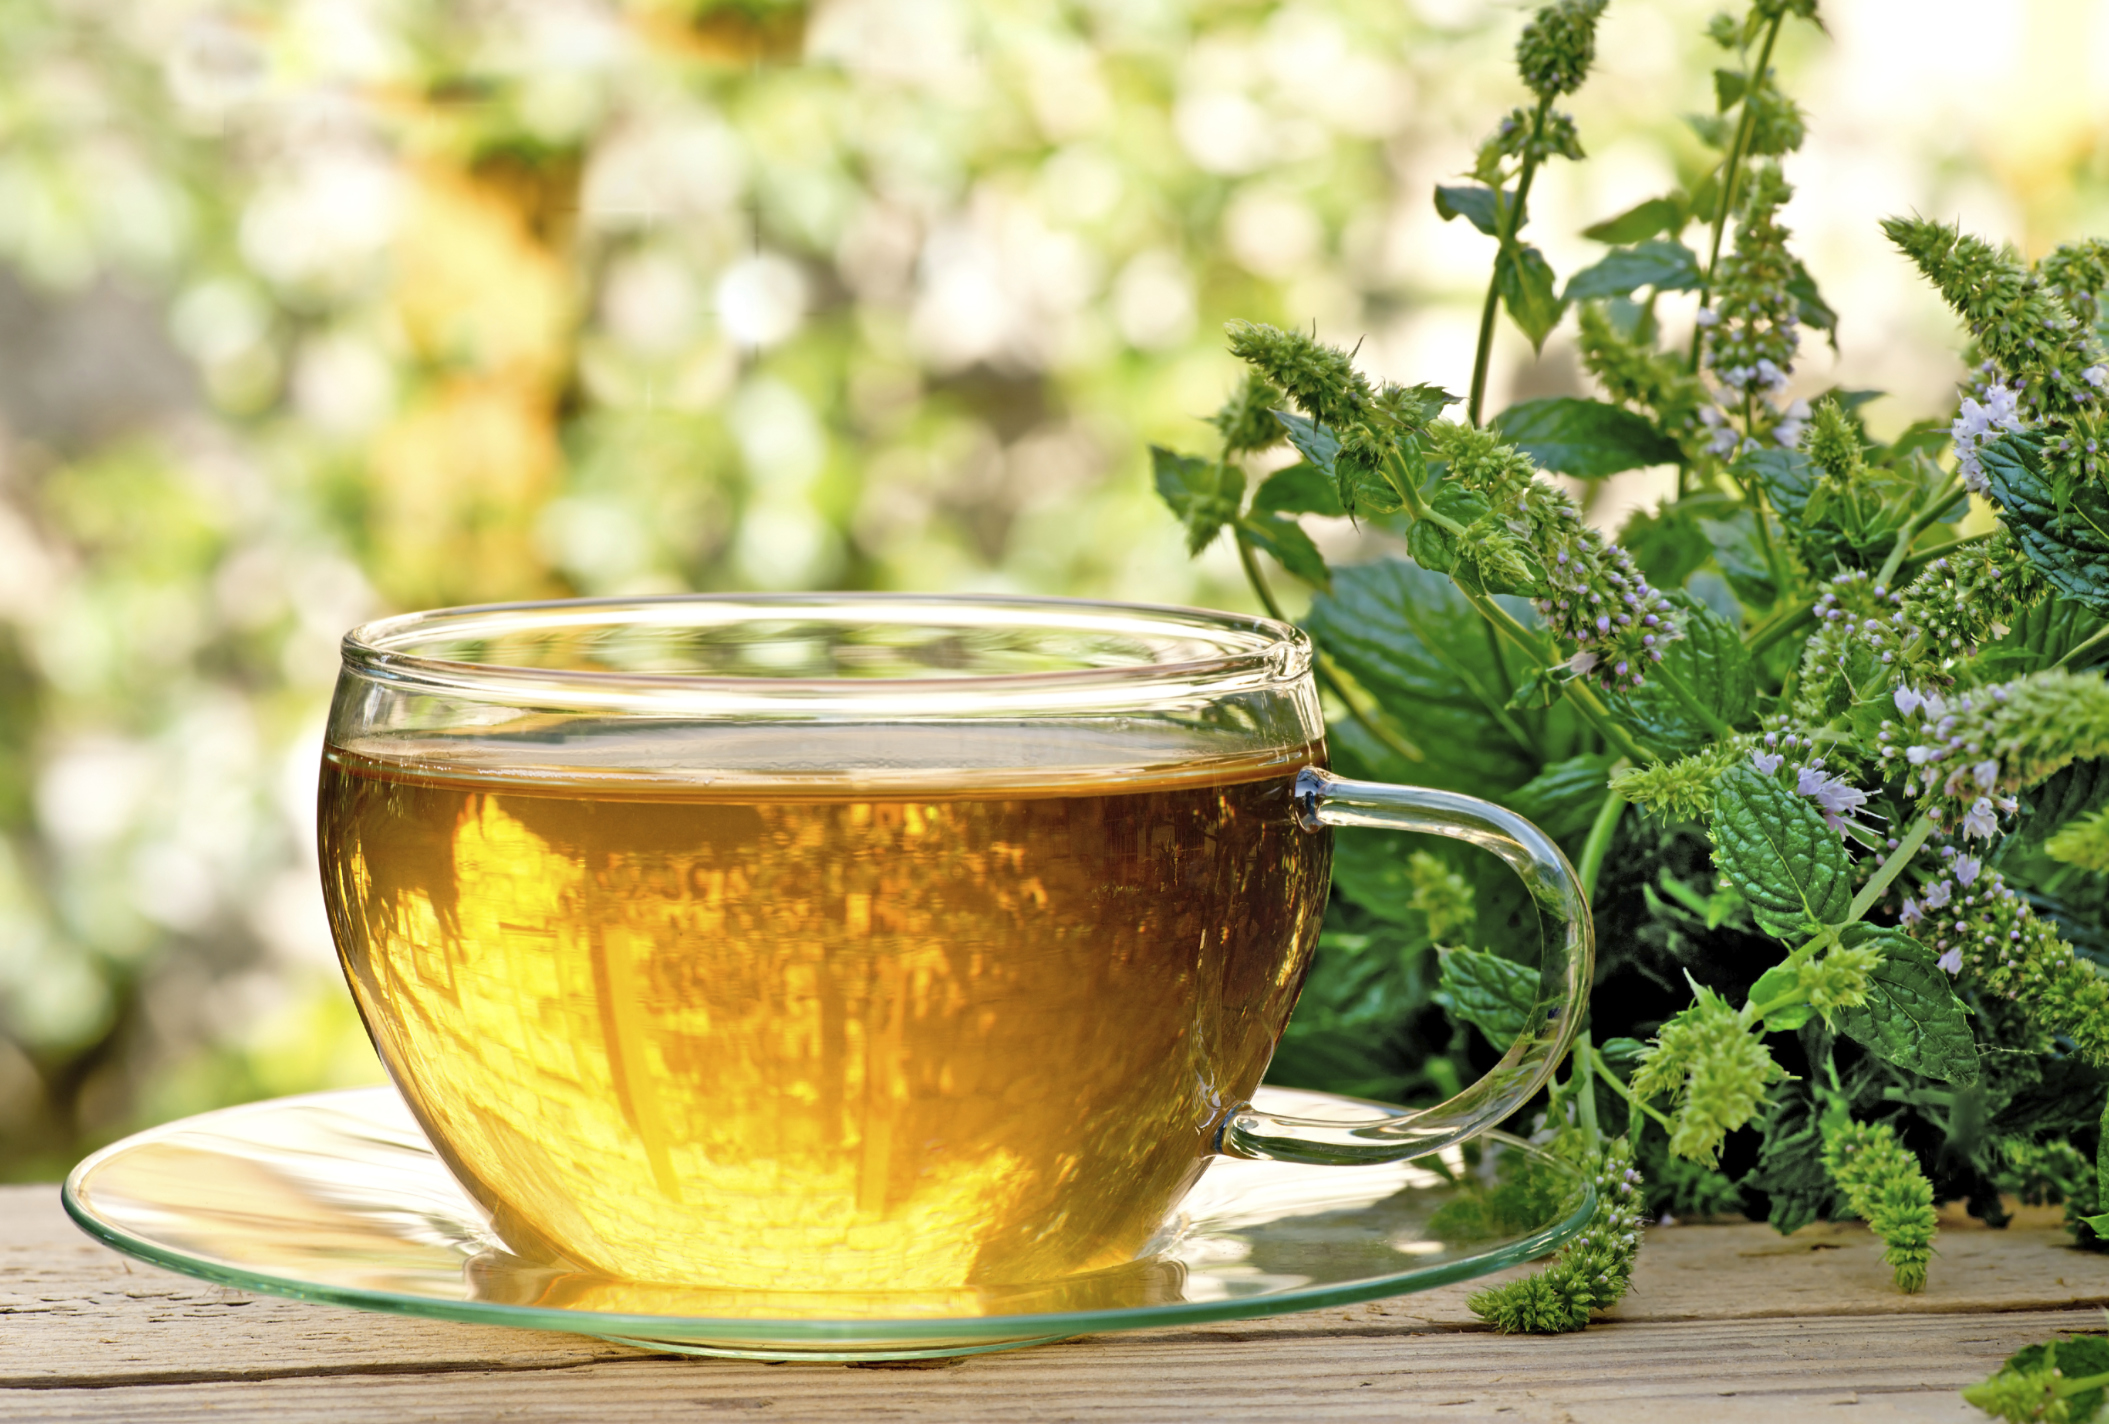 Chinese herbal insomnia tea - Chinese Herbal Insomnia Tea 20